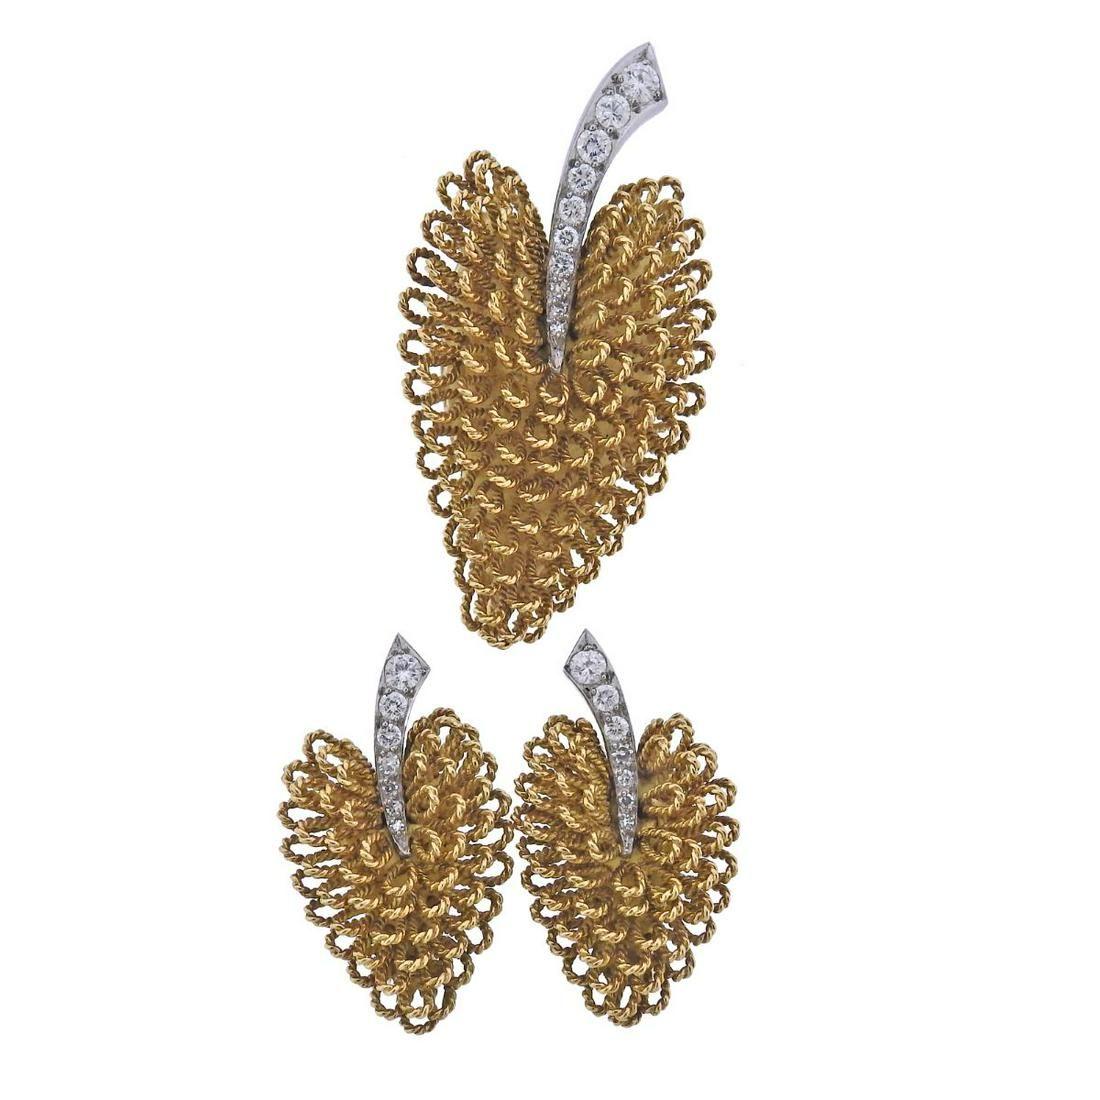 J. E. Caldwell France Mid Century 18k Gold Diamond Leaf